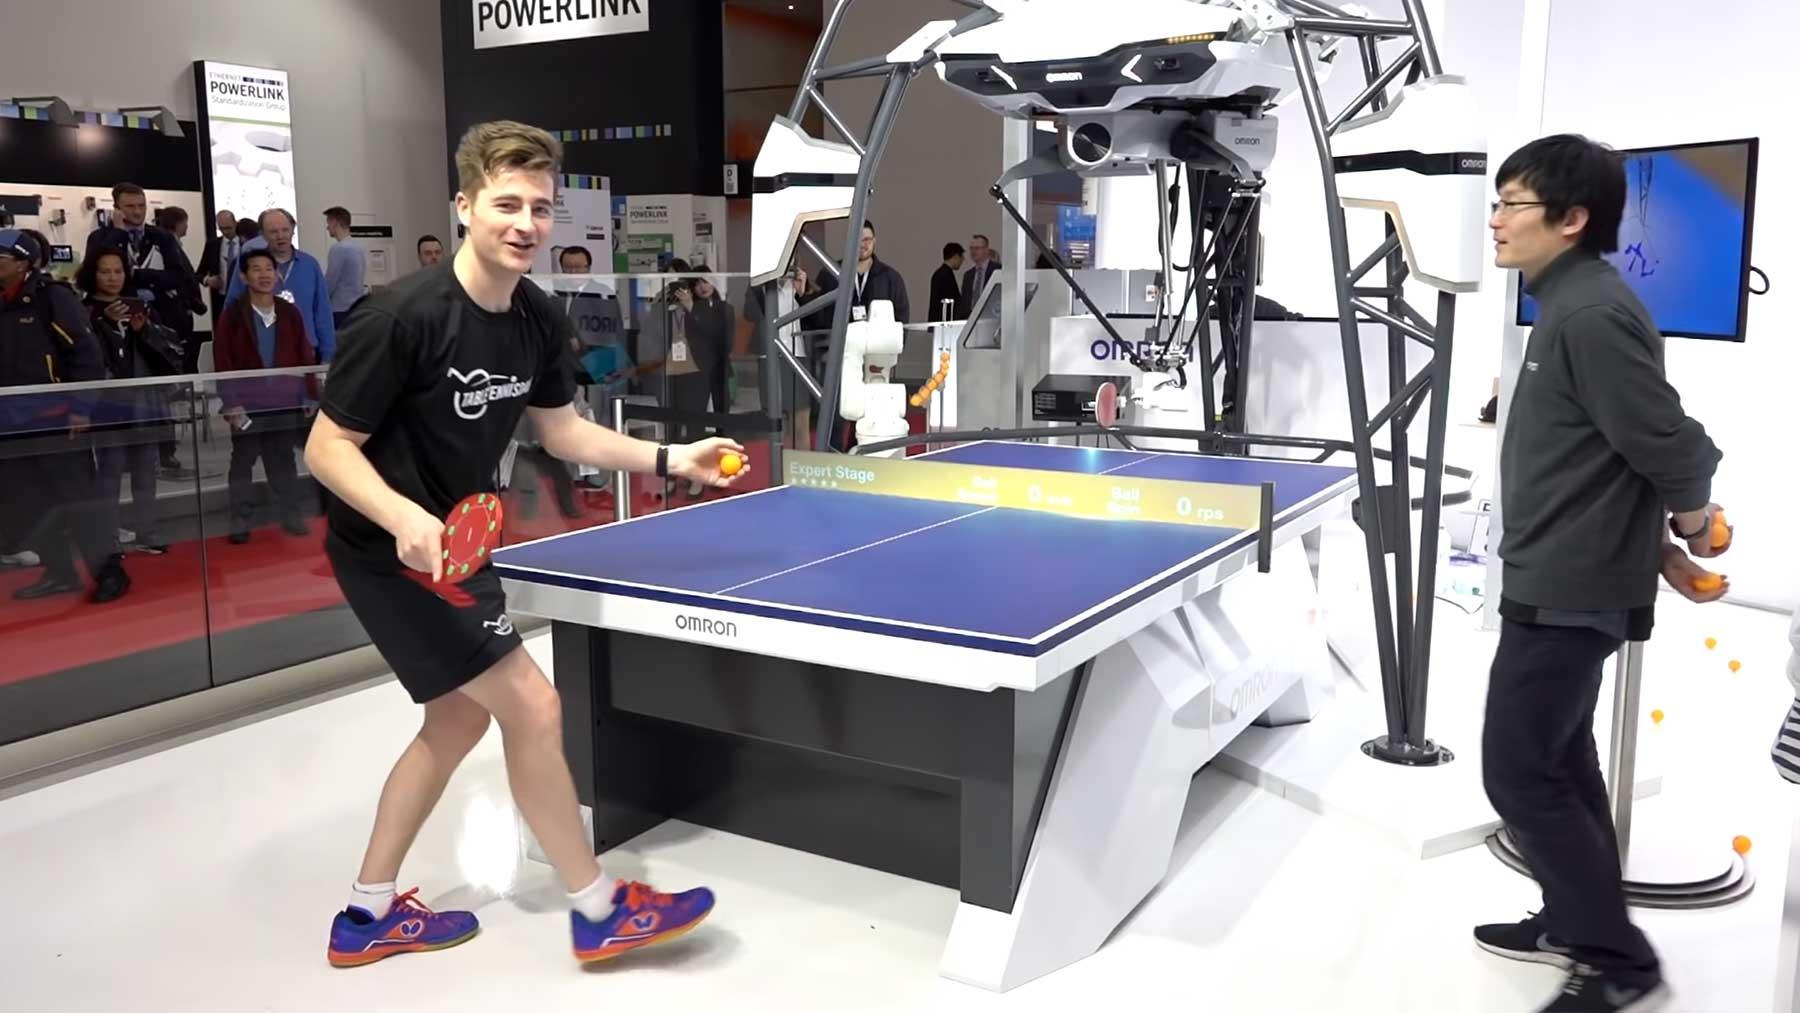 Gegen den besten Tischtennis-Roboter der Welt antreten tischtennisroboter